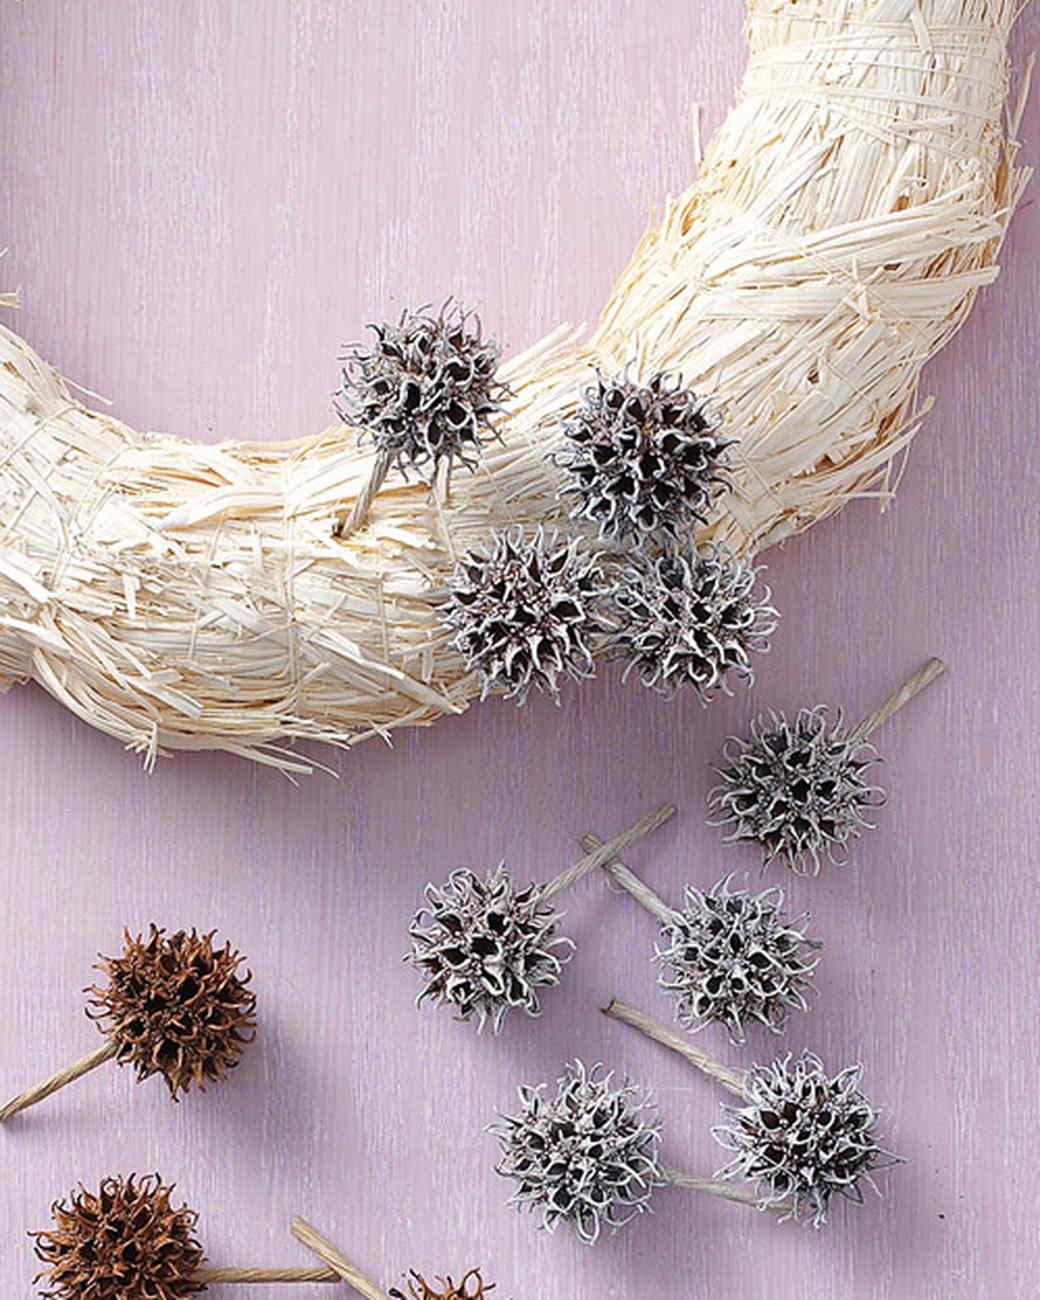 sweetgum fruit wreath martha stewart. Black Bedroom Furniture Sets. Home Design Ideas